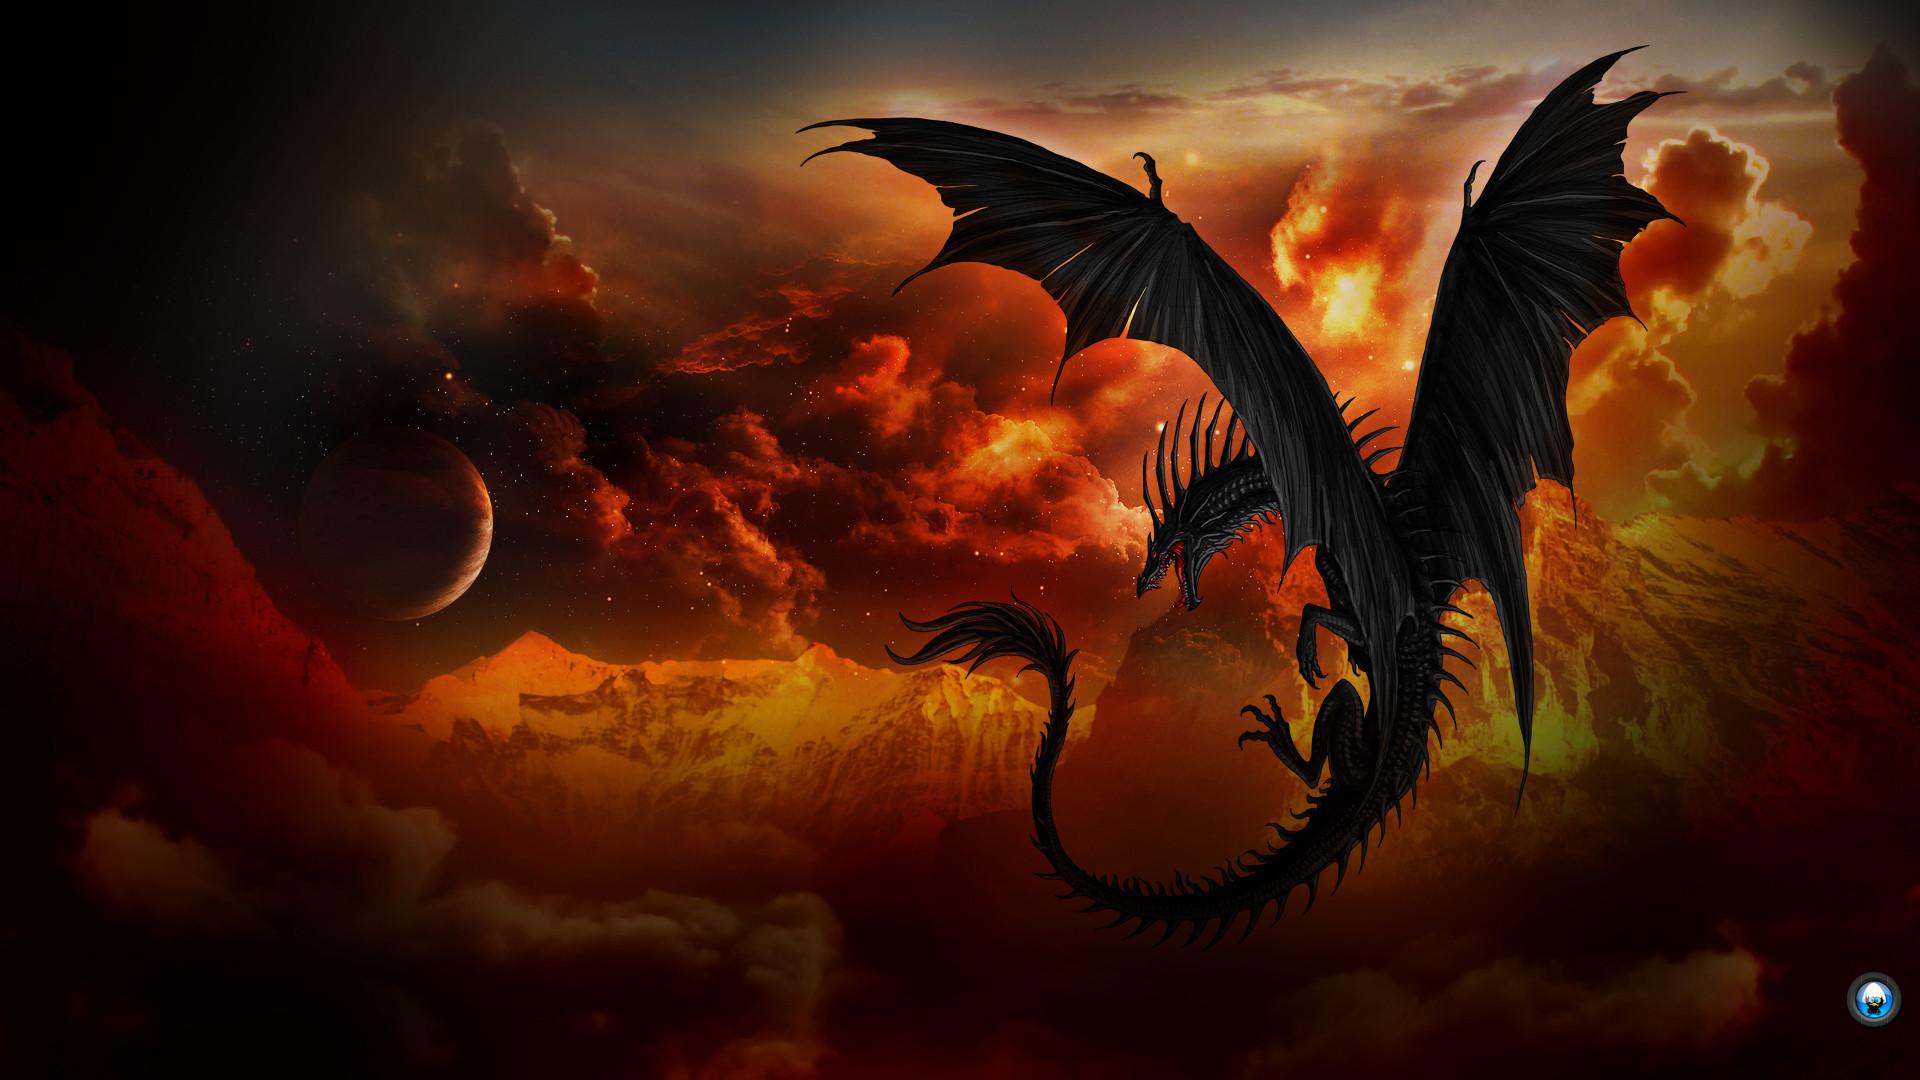 black dragon wallpaper desktop 65 images